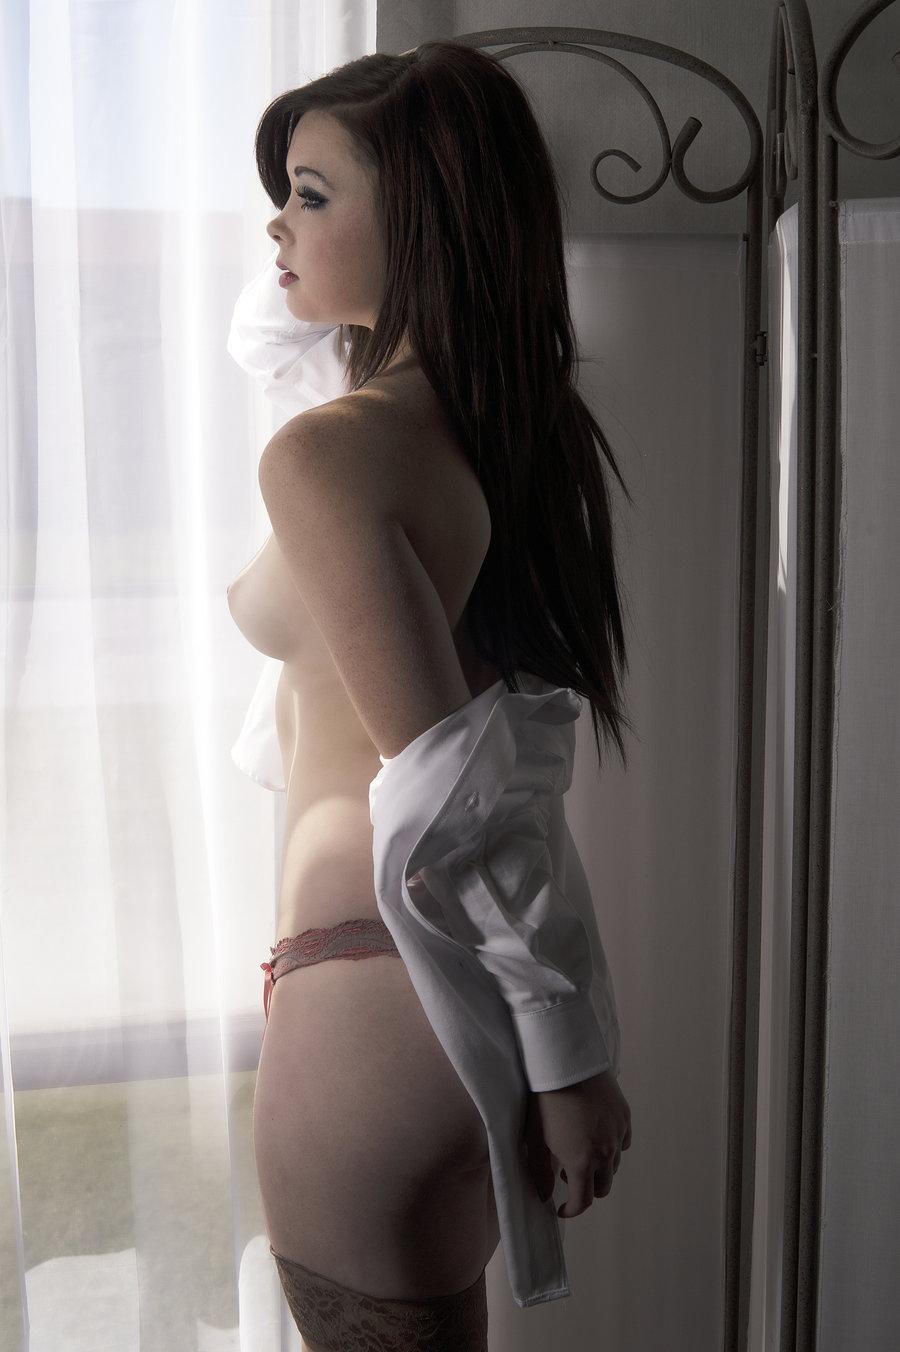 Pregnant anime girl with dildo